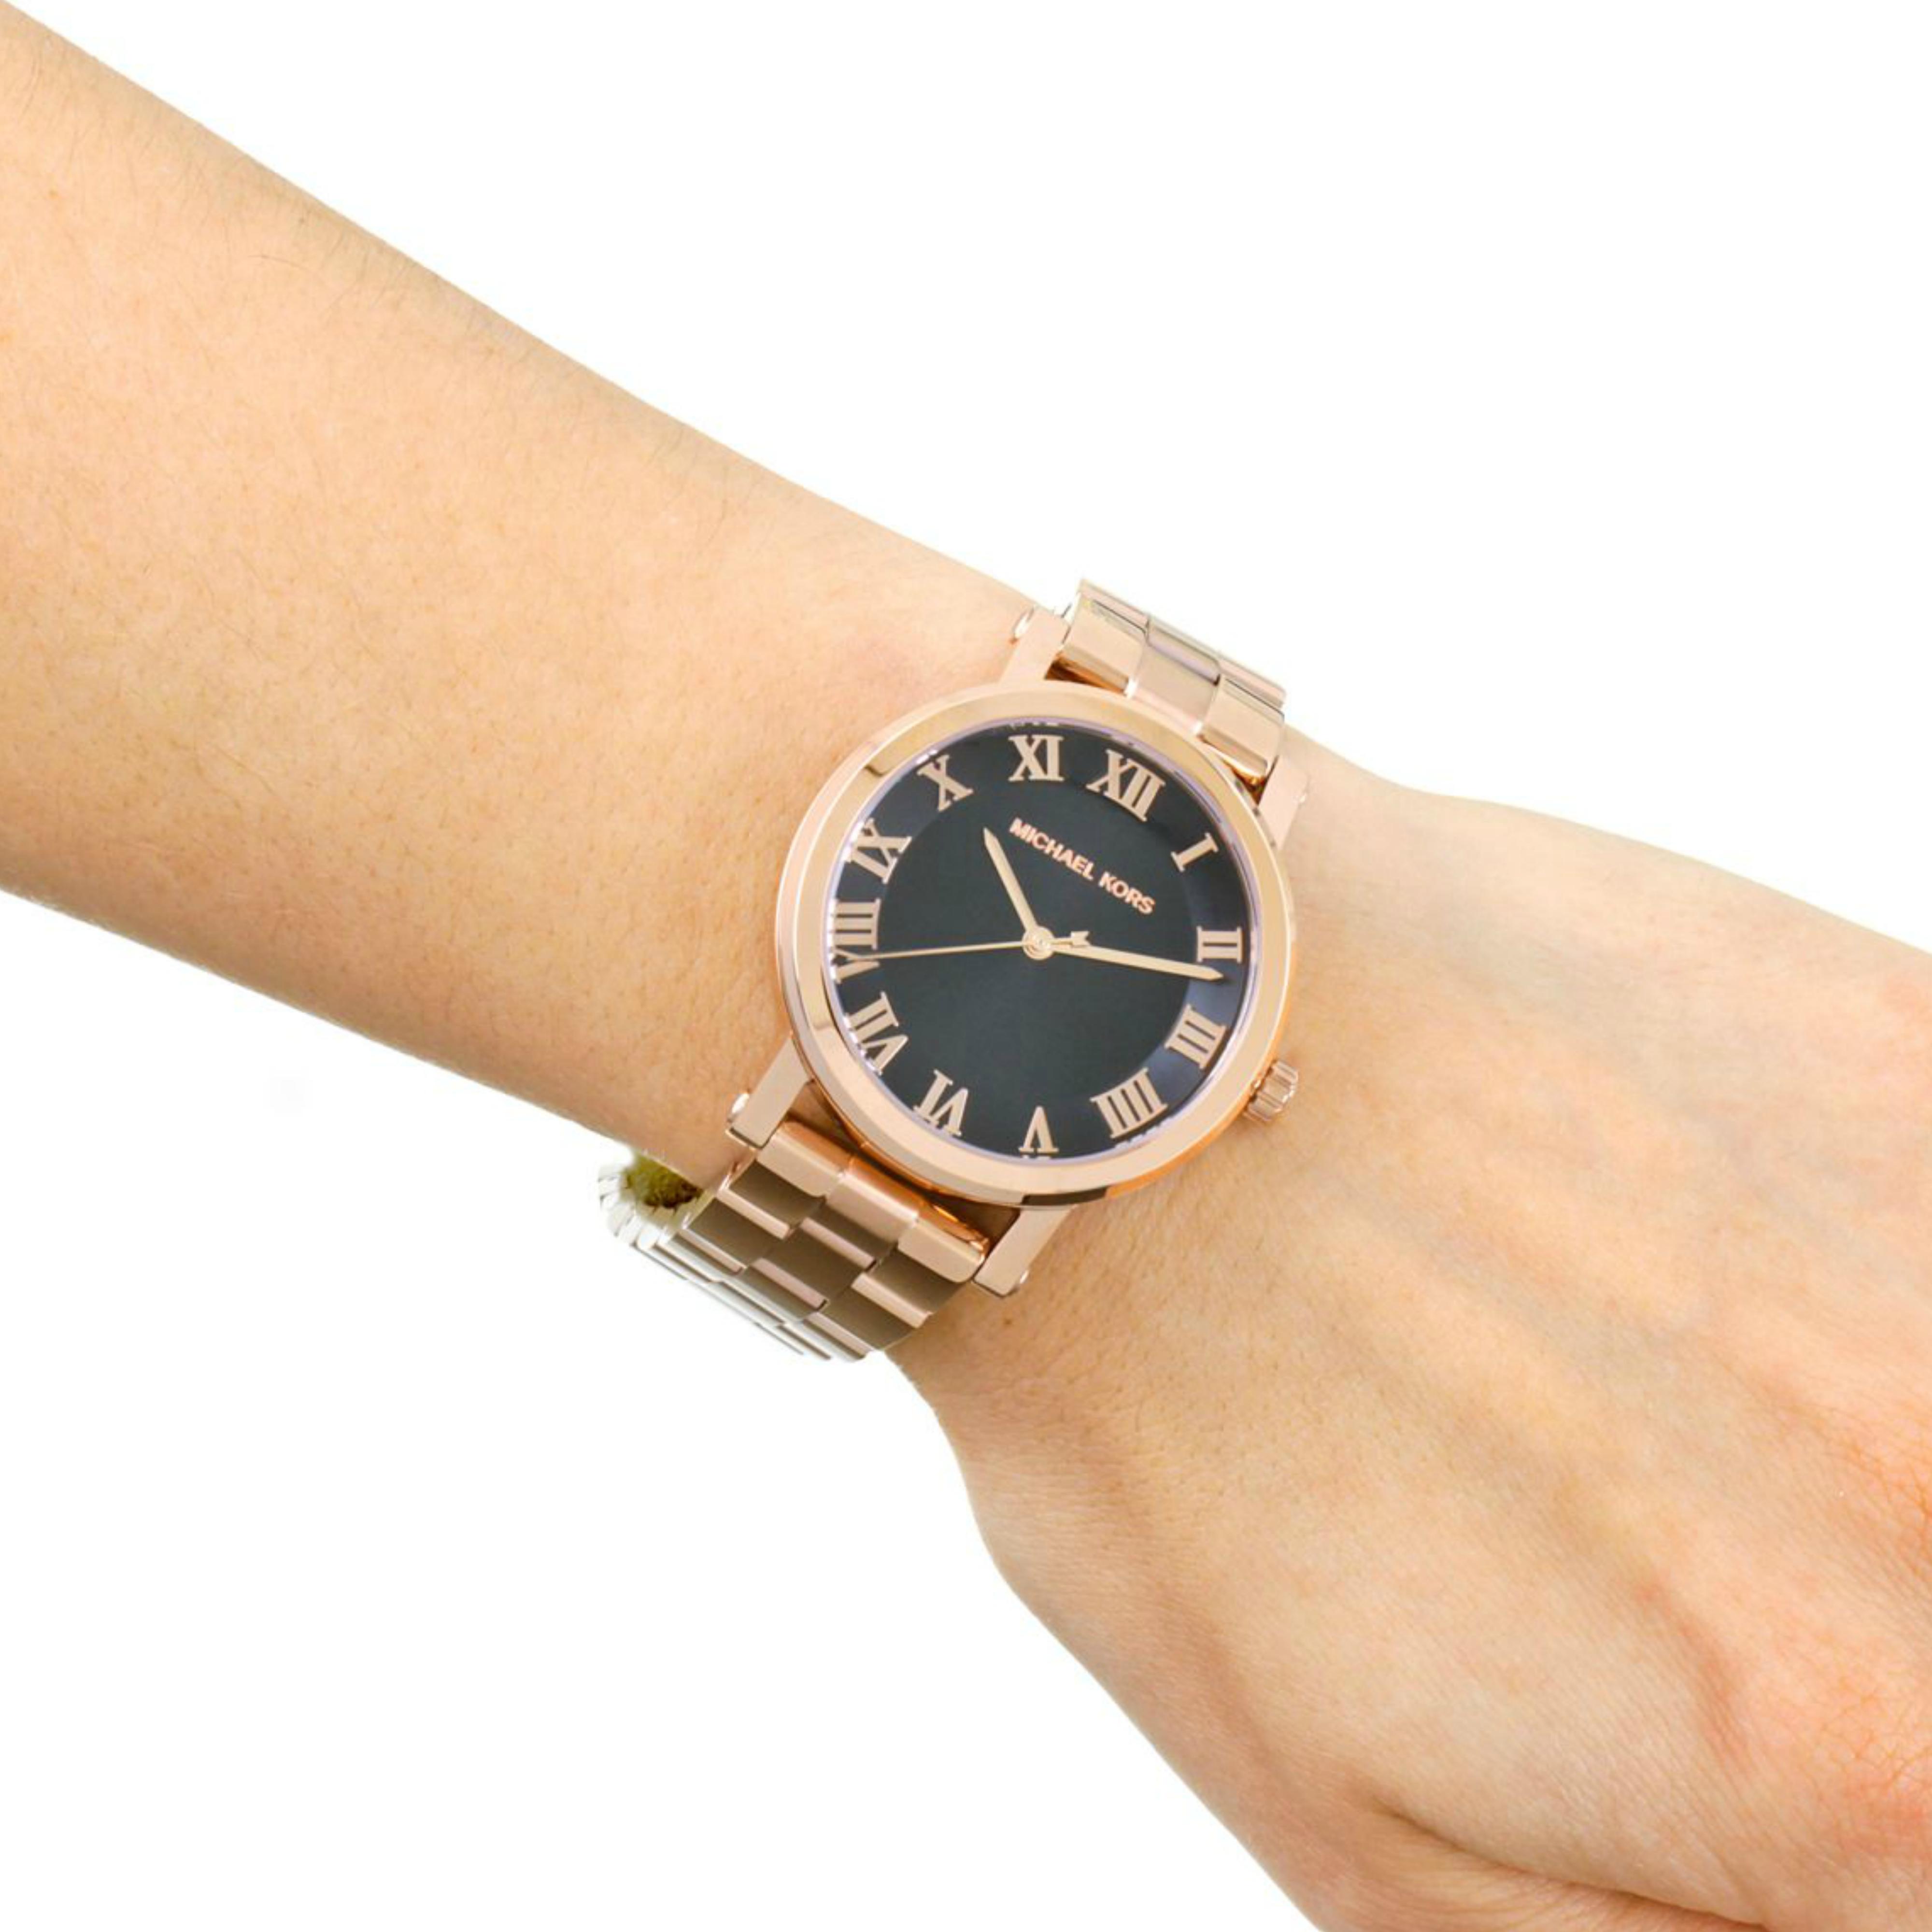 3bfff50adf4c Michael Kors Norie Ladies Black Dial Rose Gold Tone Stainless Steel Watch  MK3585 Thumbnail 8